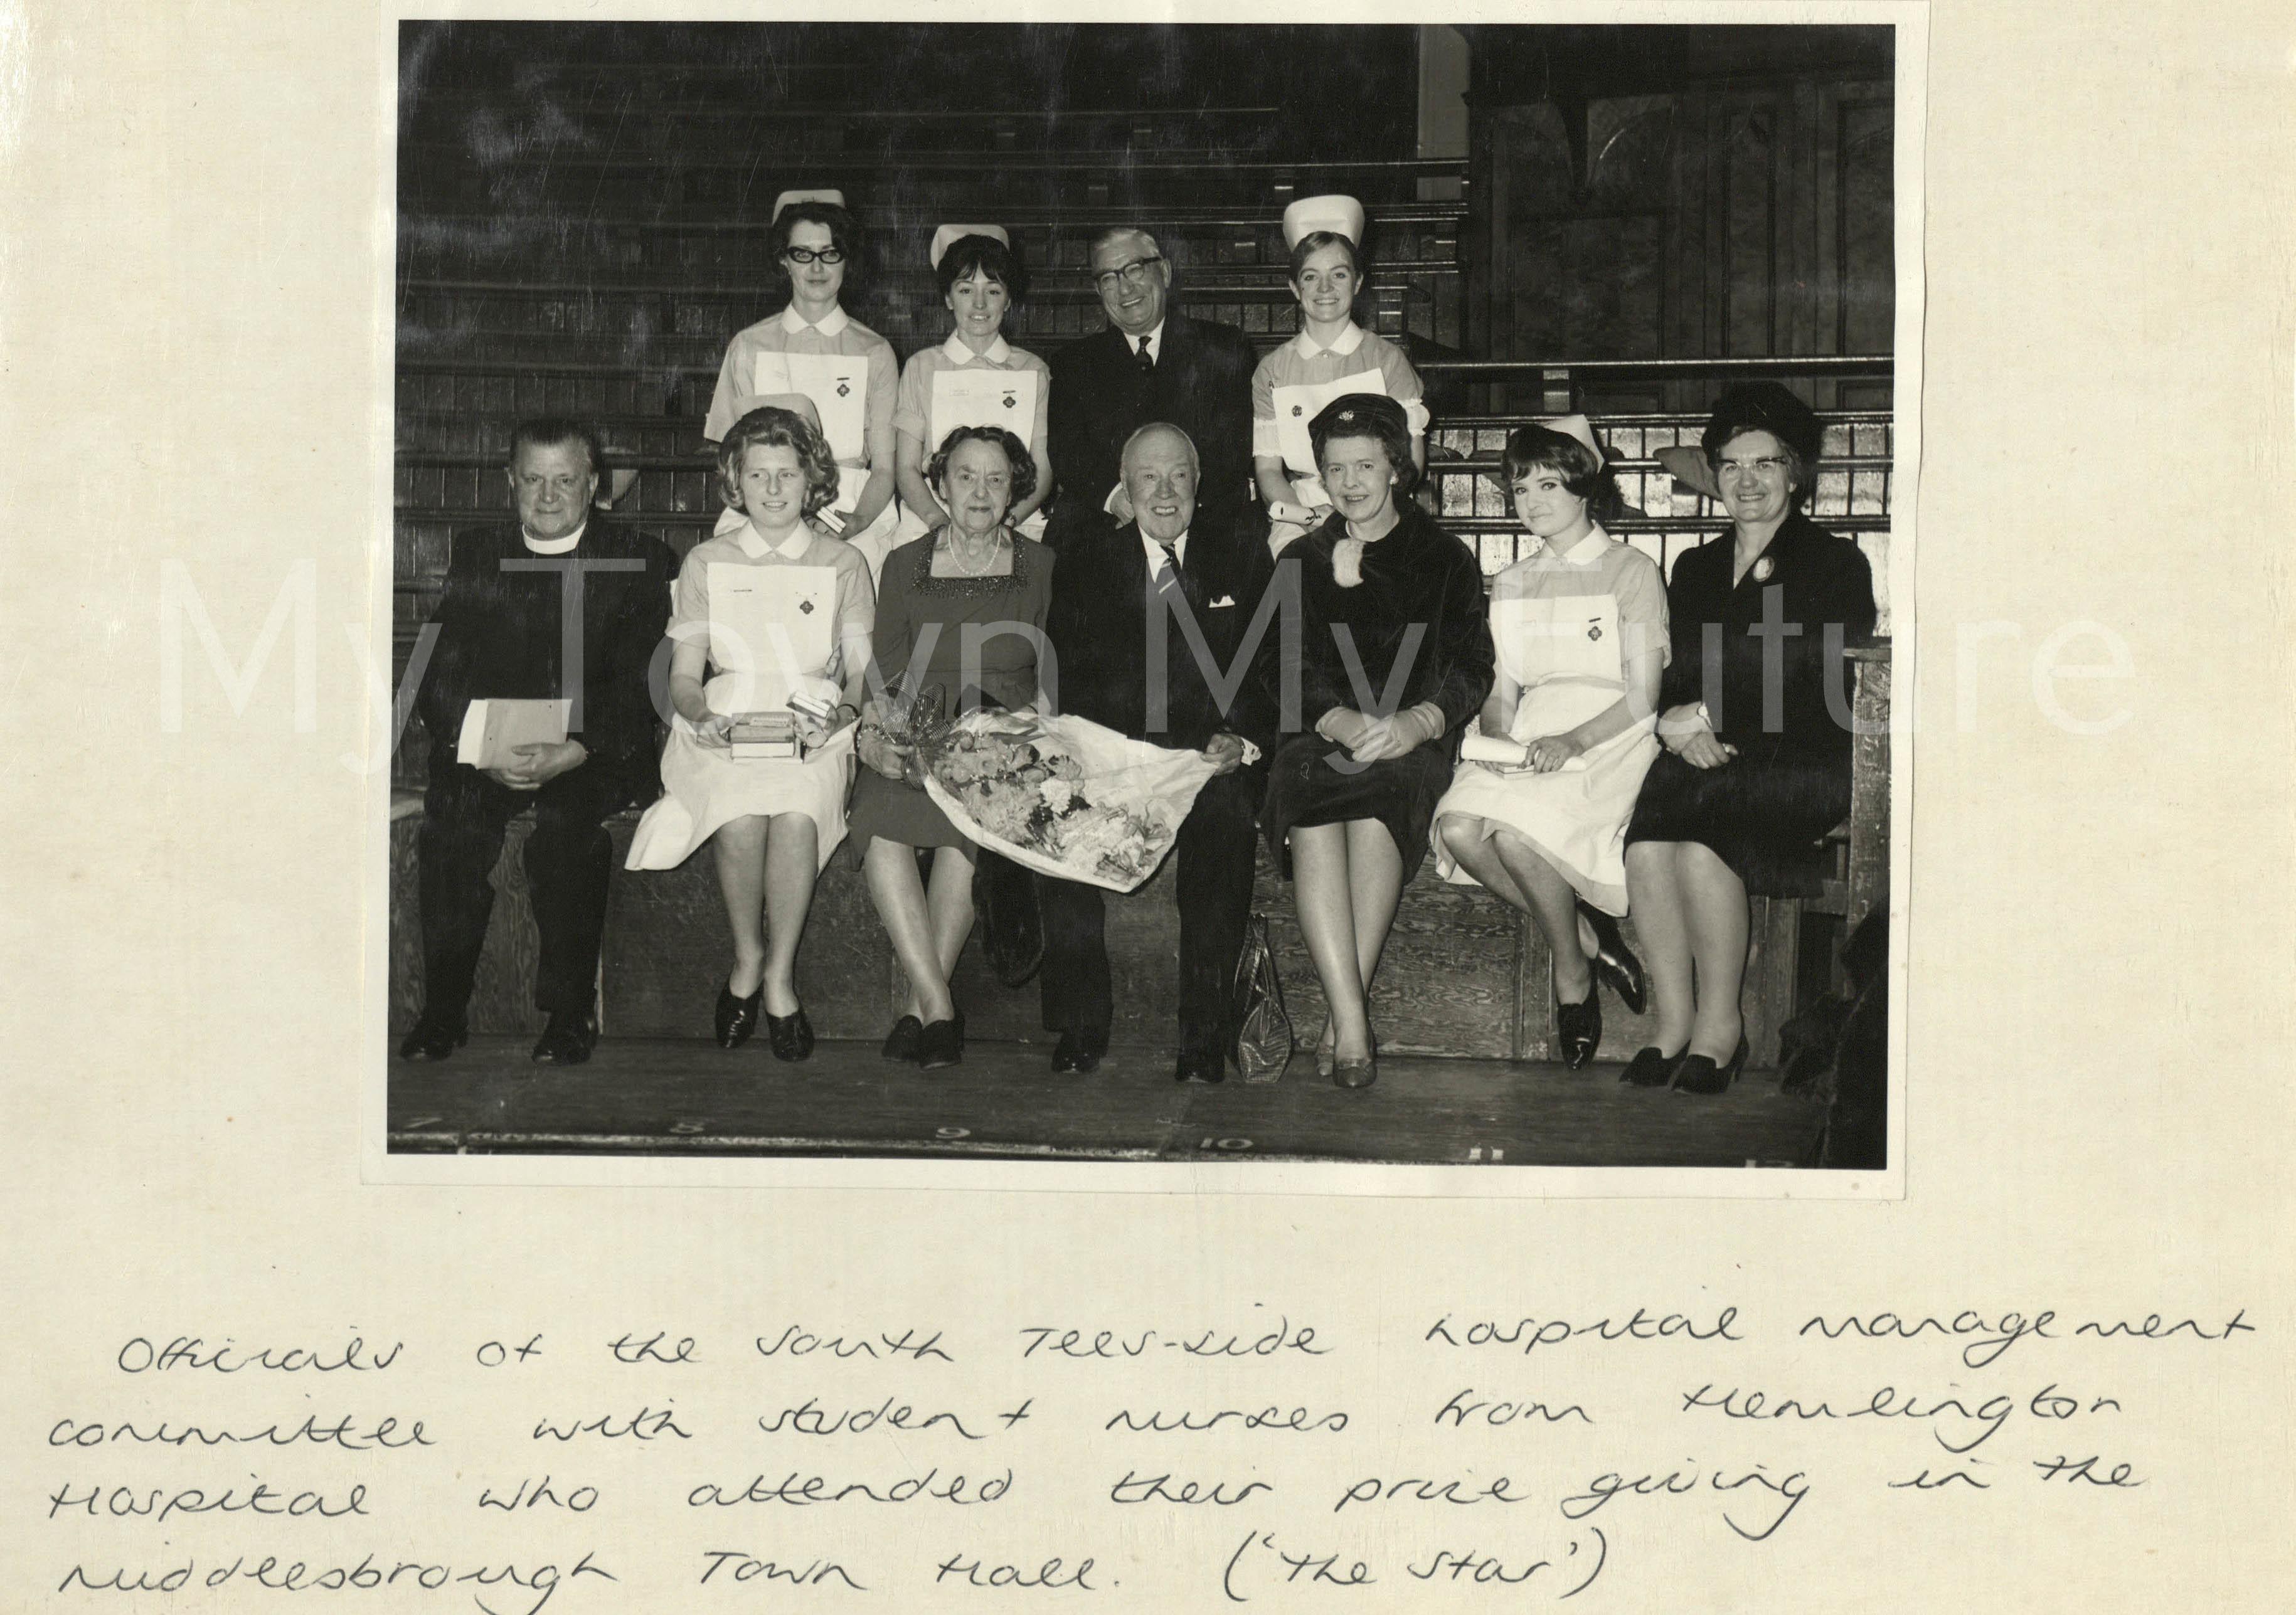 Hemlington Hospital Prize Giving, 1966 - The Star